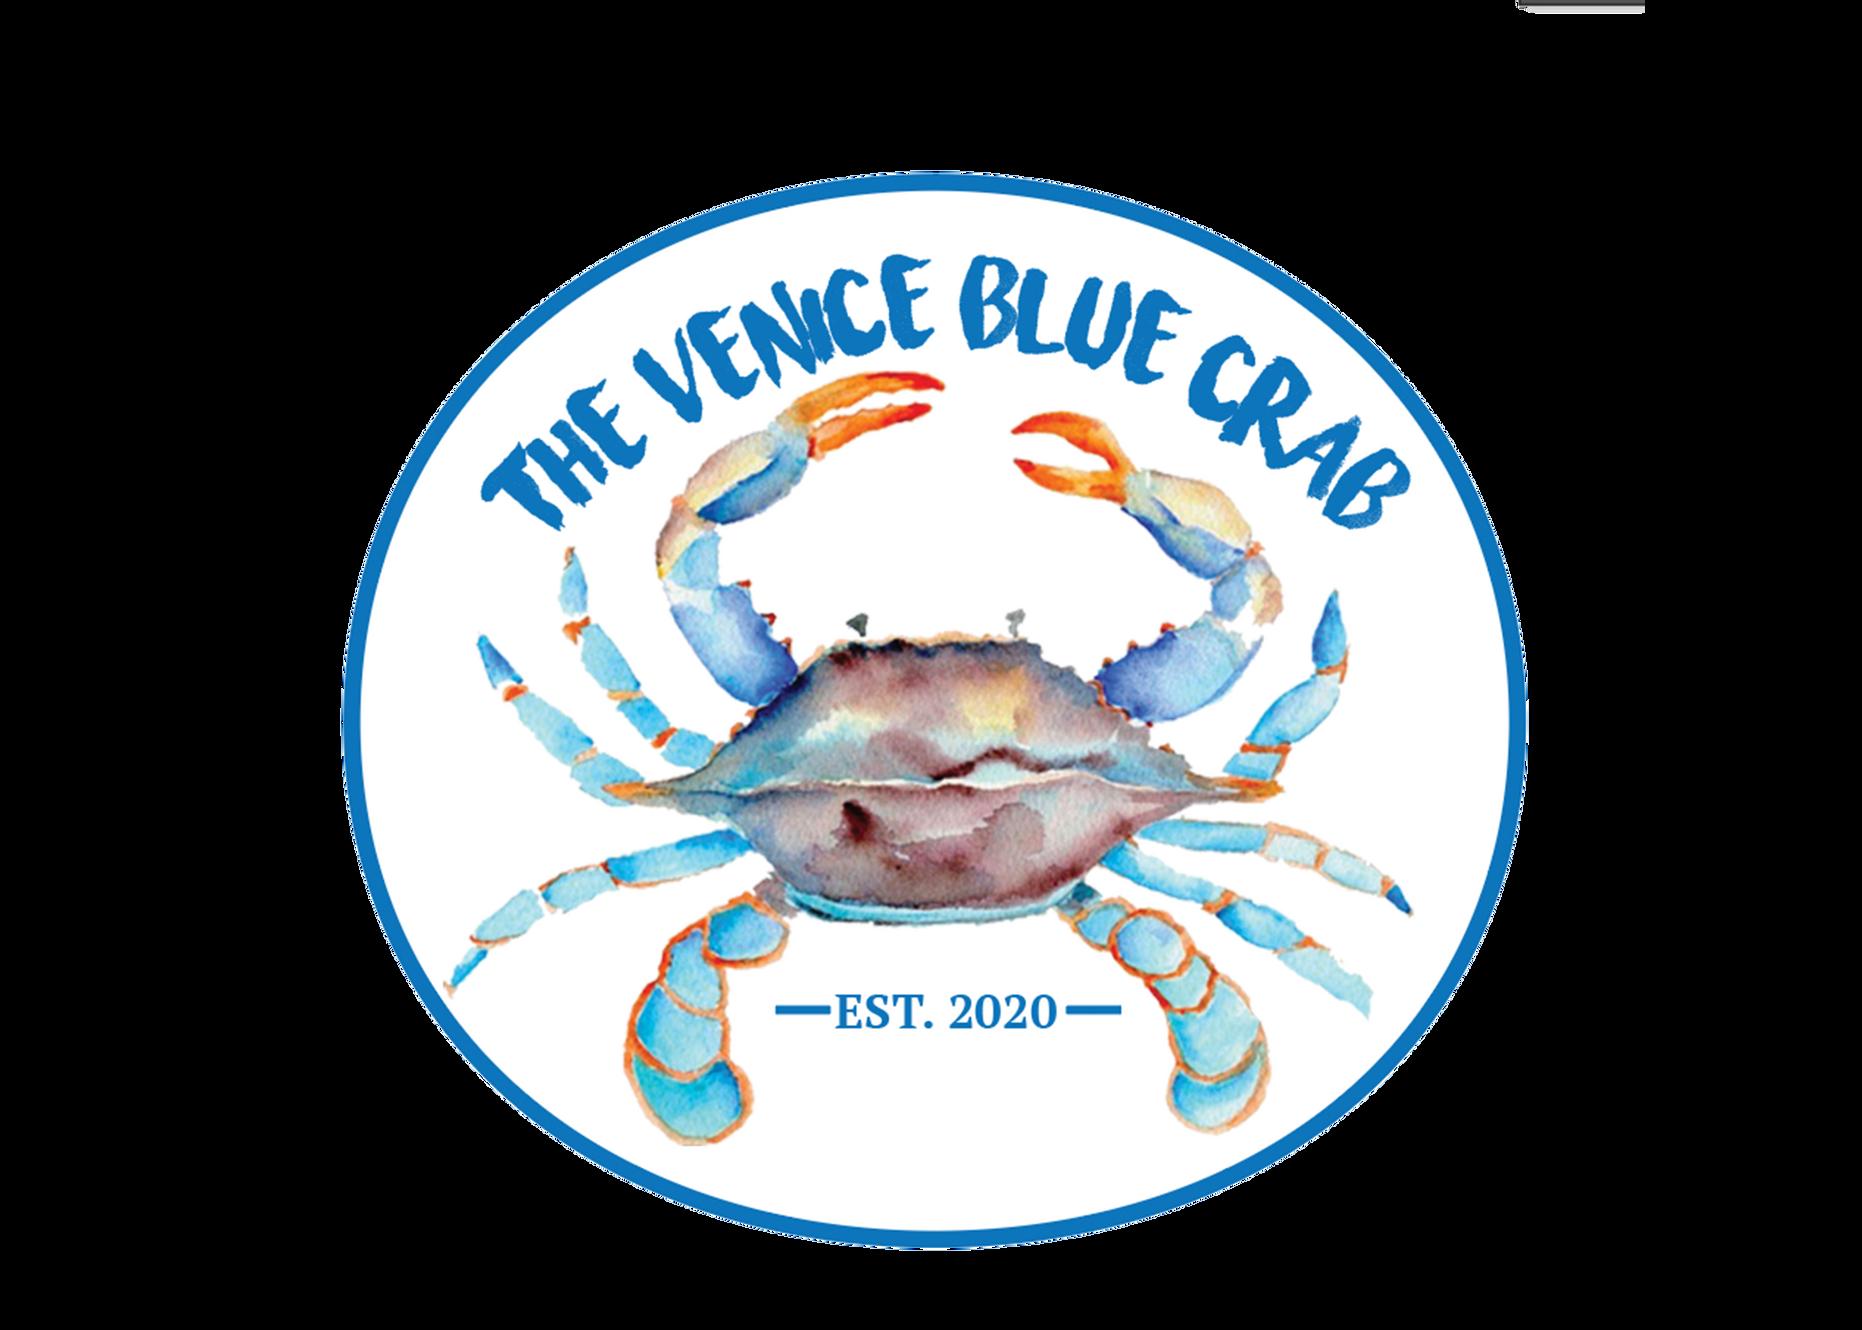 www.venicebluecrablodge.com